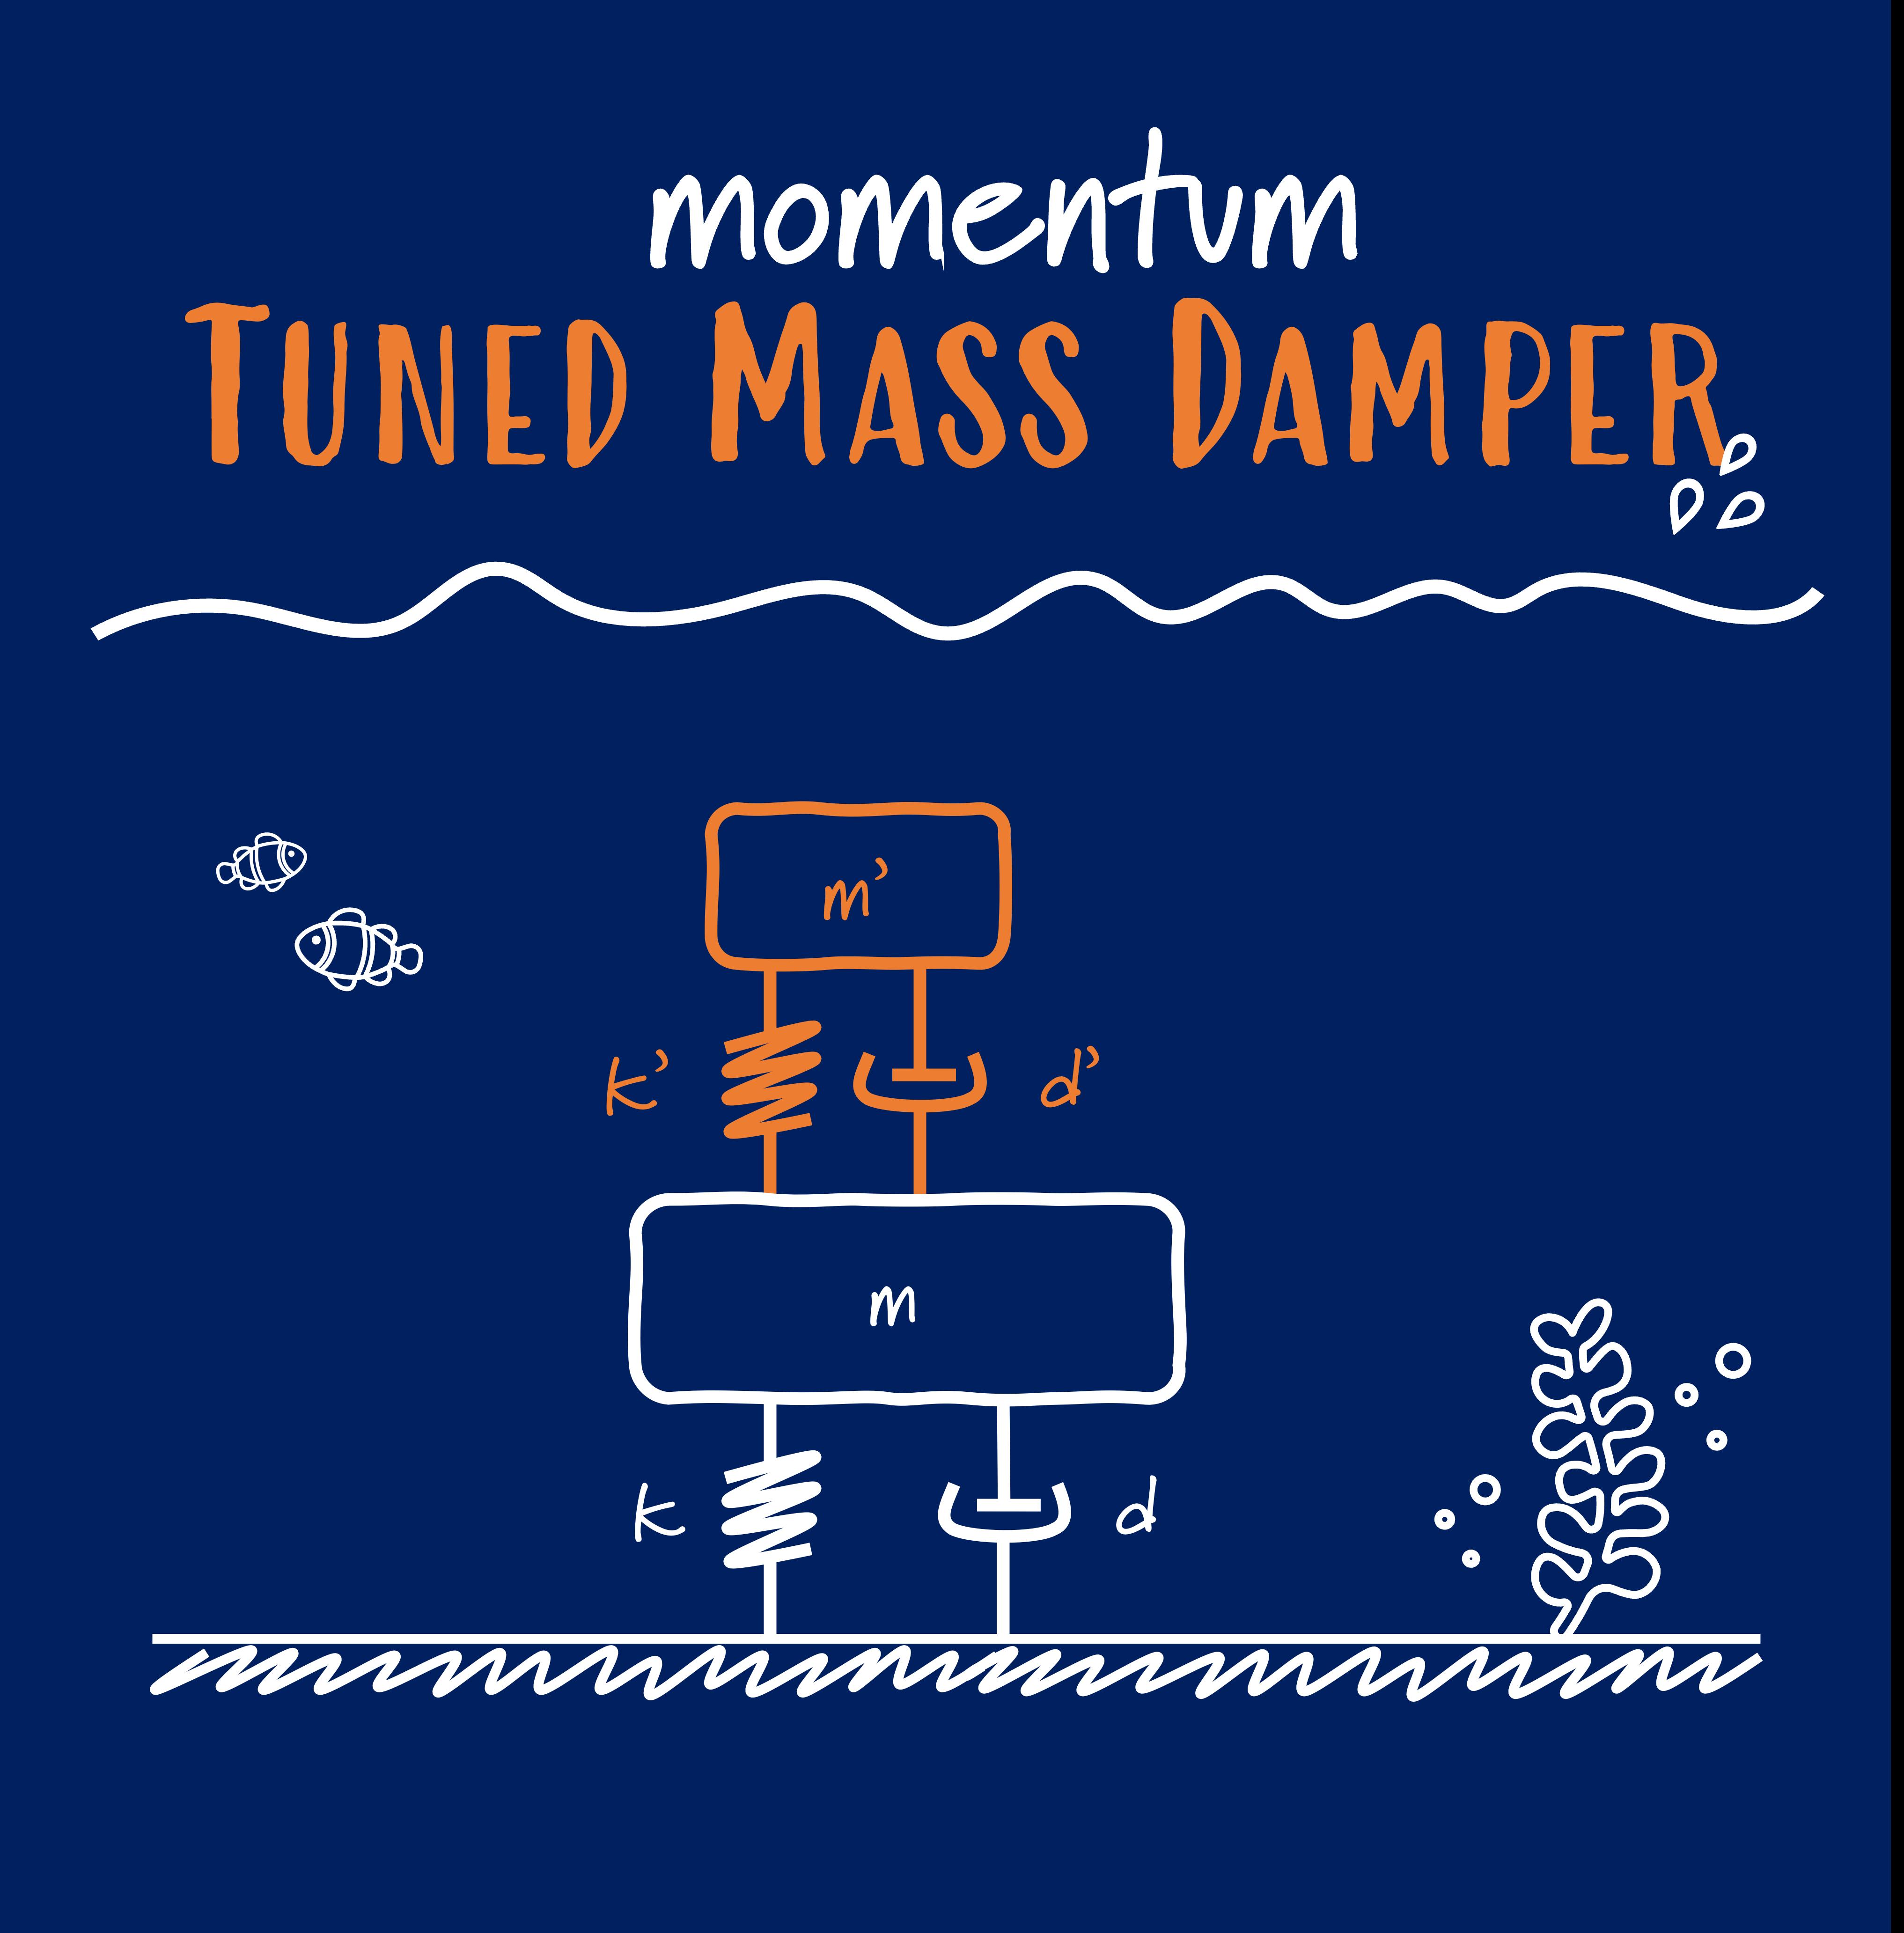 momentum tuned mass damper subsea